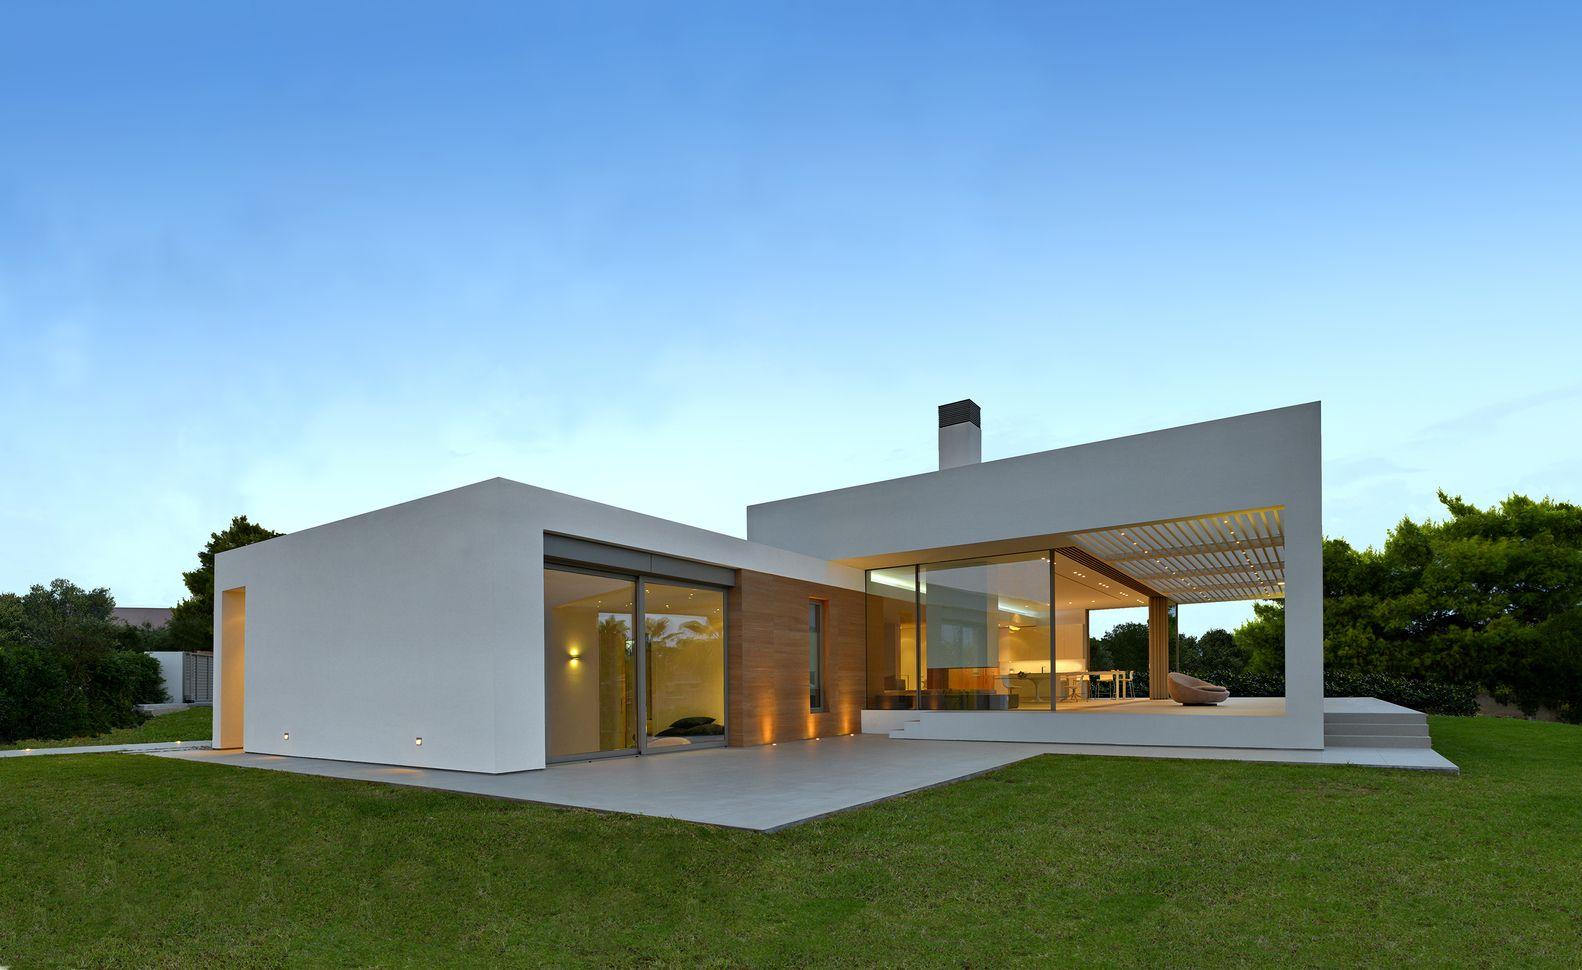 Reihe nach hause exterieur design gallery of house in zakynthos  katerina valsamaki architects